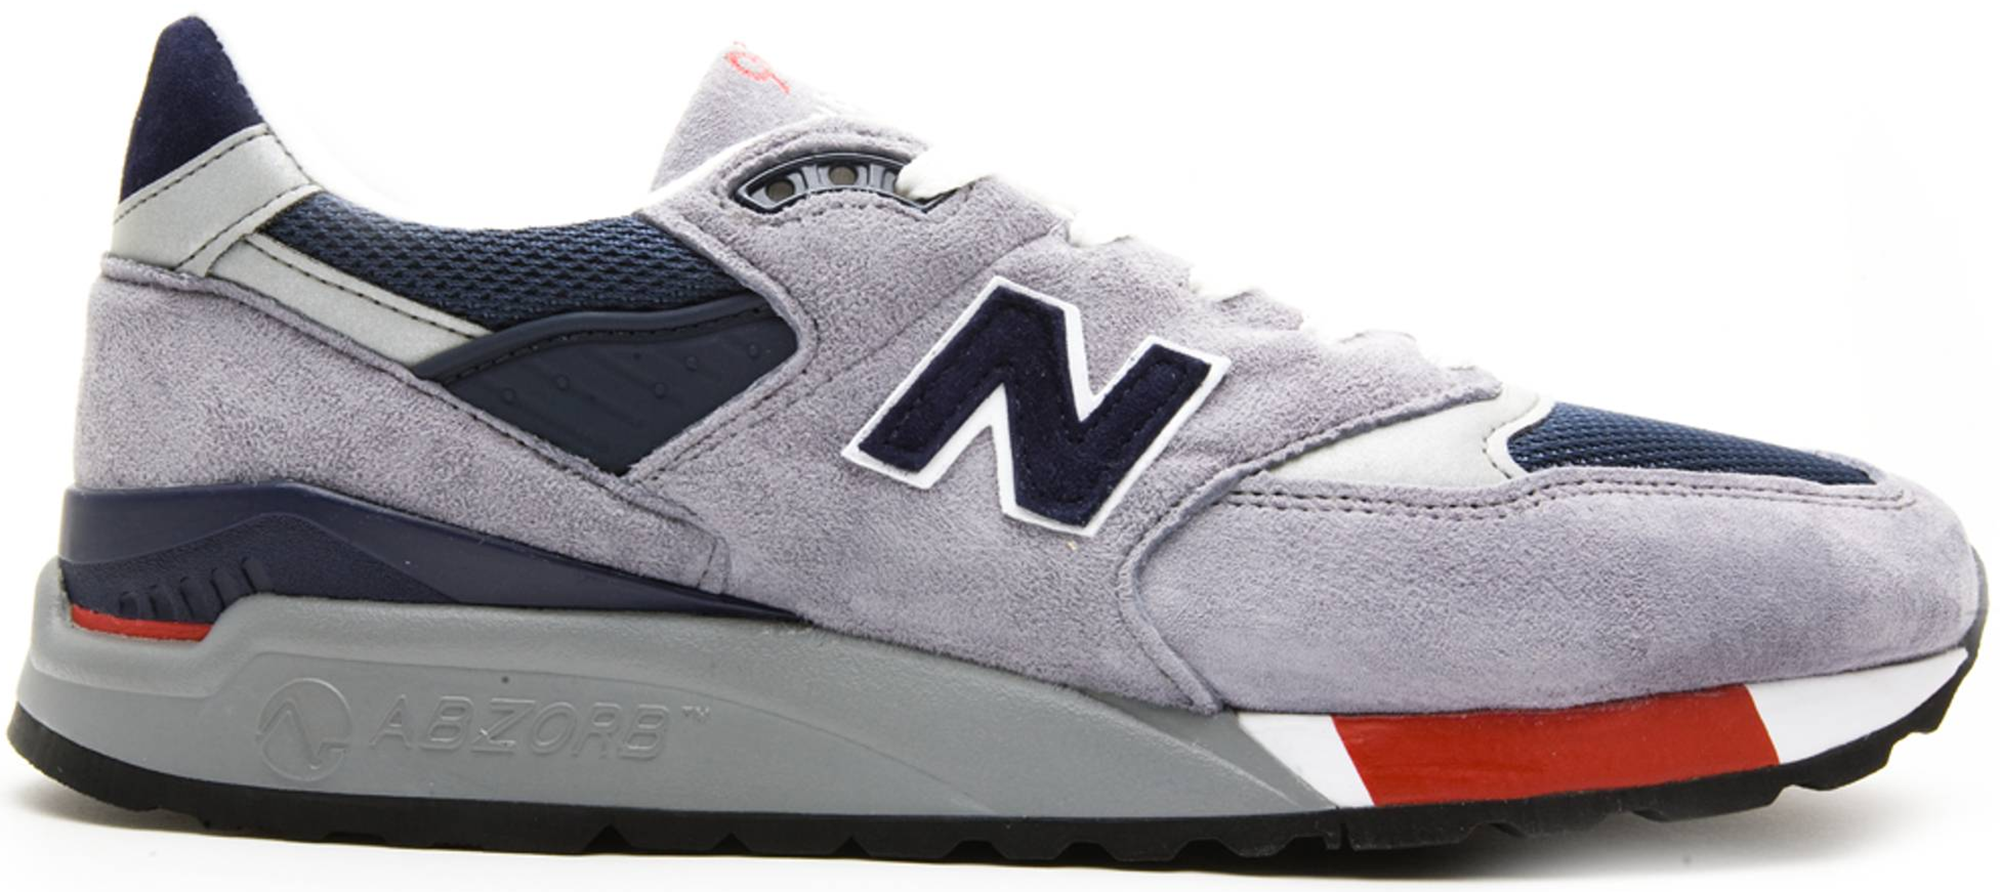 New Balance 998 Grey Navy Red - Novelship